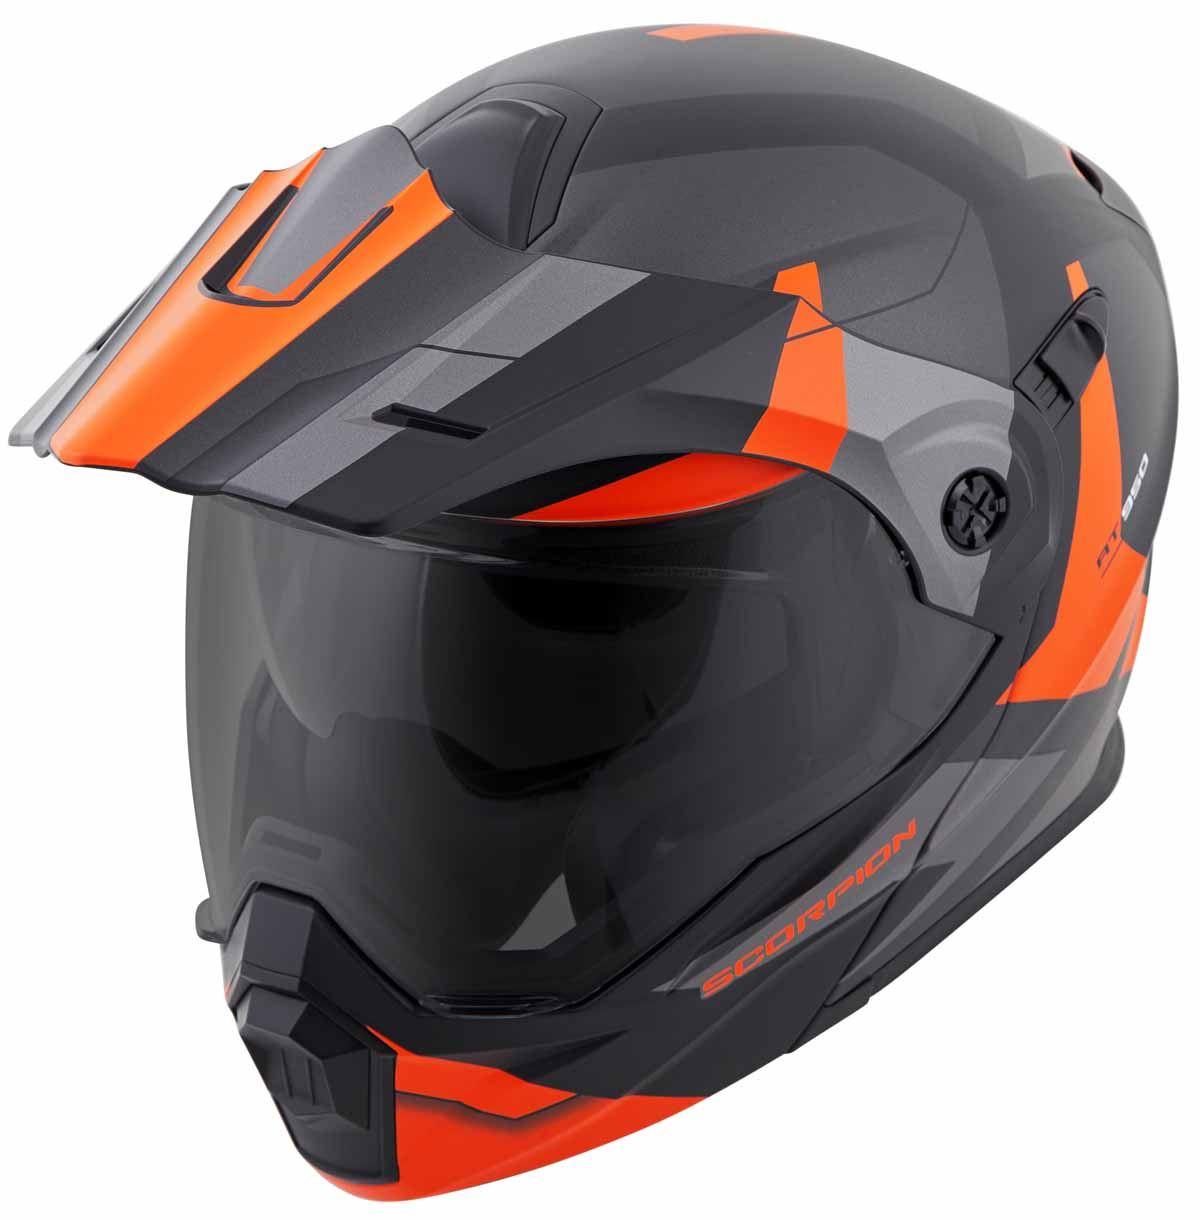 Scorpion-EXO-AT950-Helmet-Flip-Up-Modular-Dual-Sport-Adventure-ADV-DOT-XS-3XL miniature 53